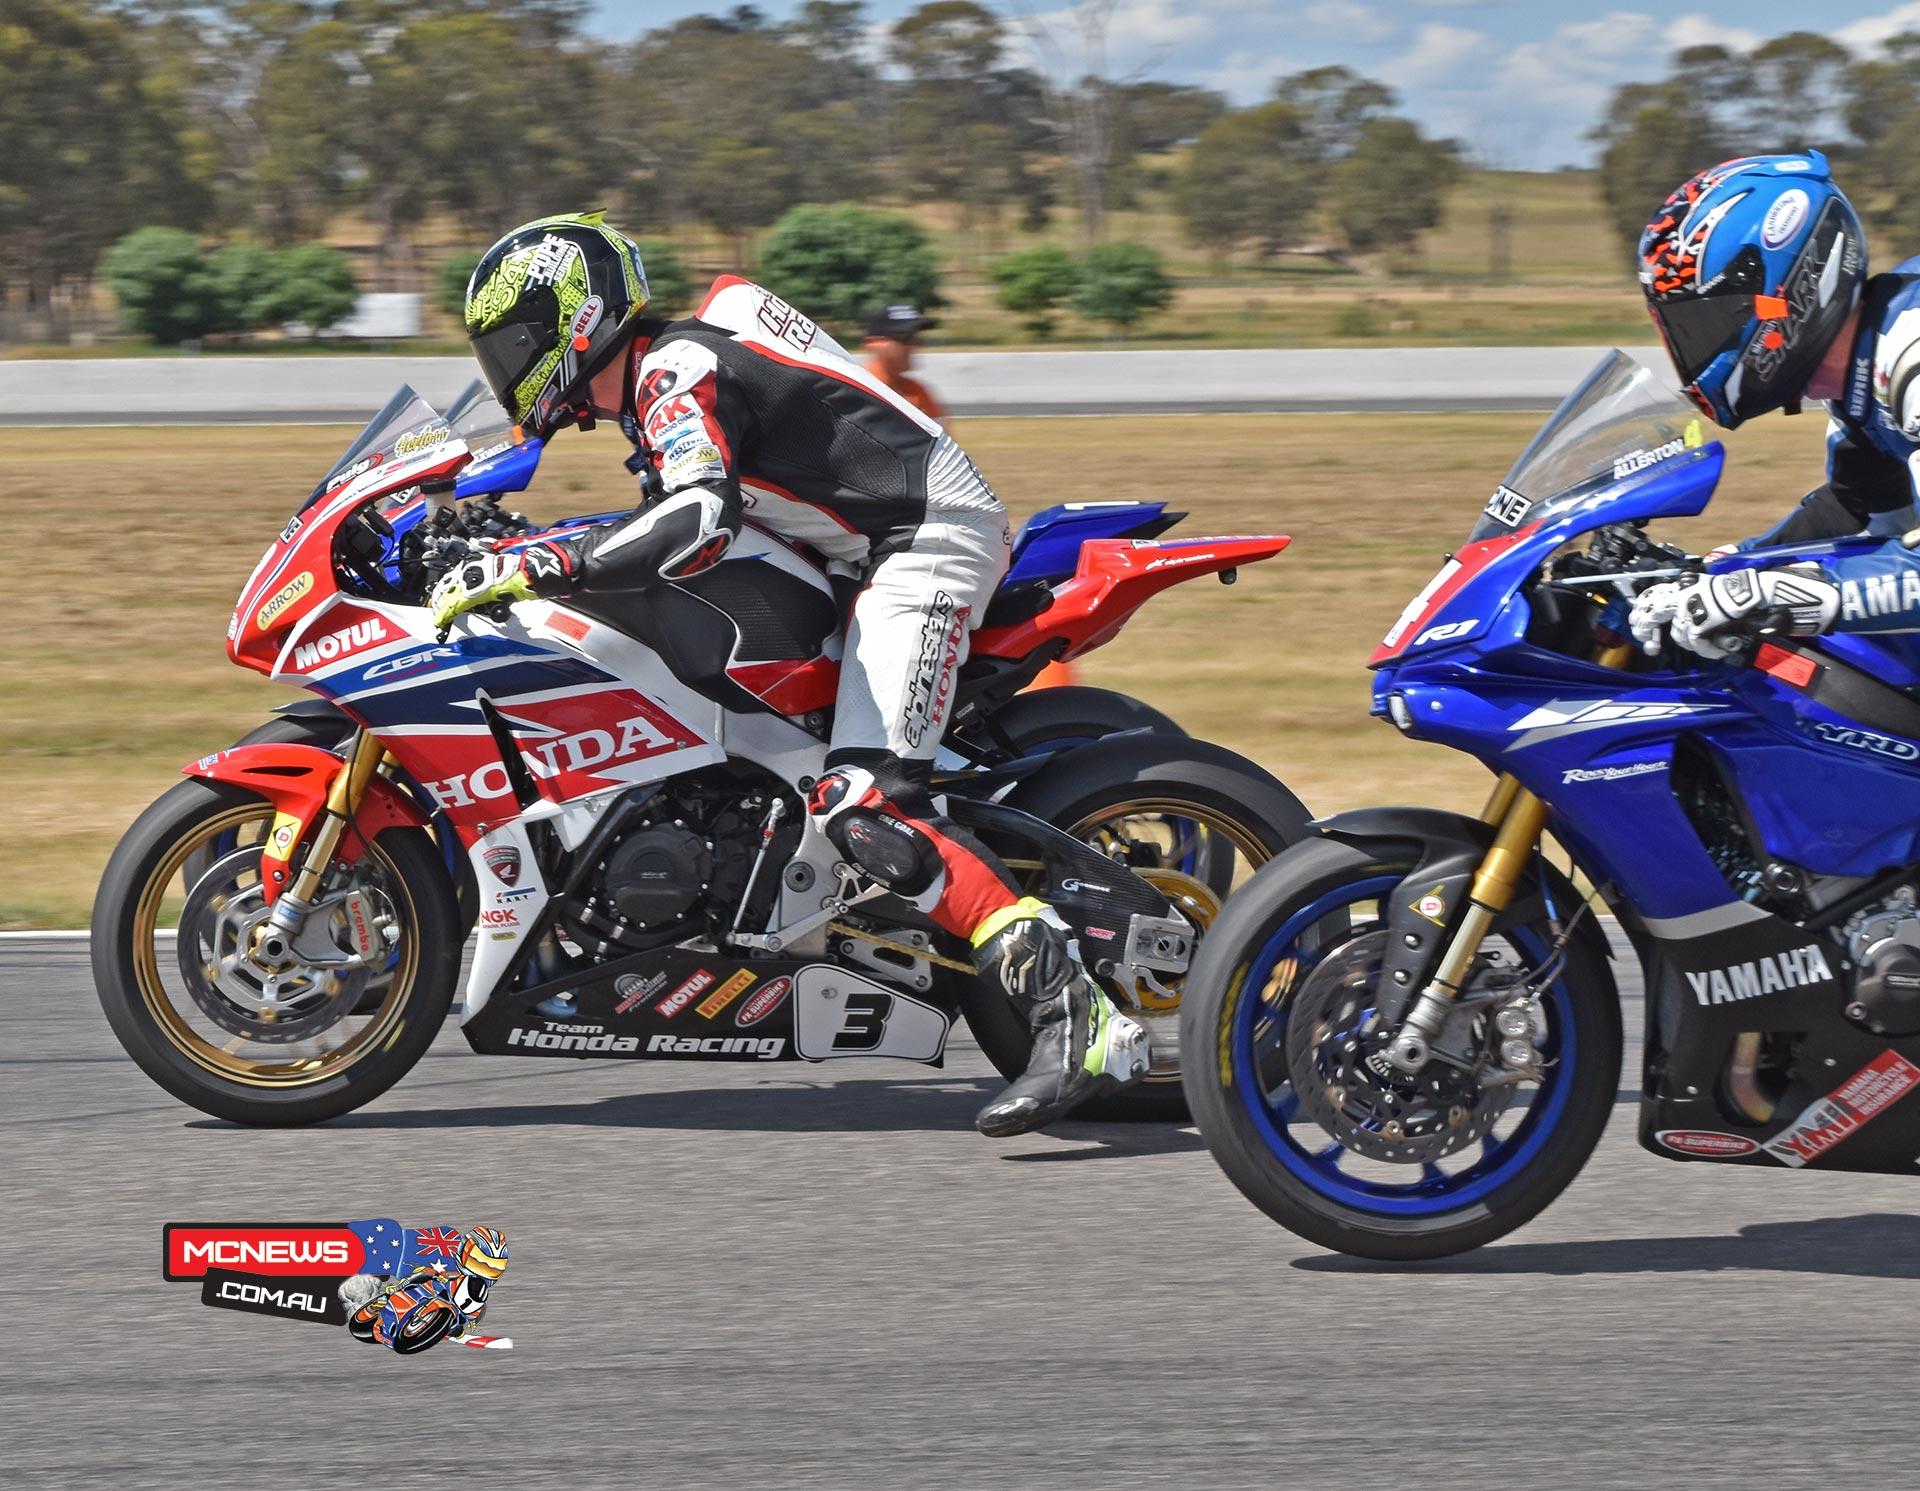 Swann Australasian FX Superbike Championship 2015 - Round Six - Winton Motor Raceway - Ipone Superbike Race Three Start